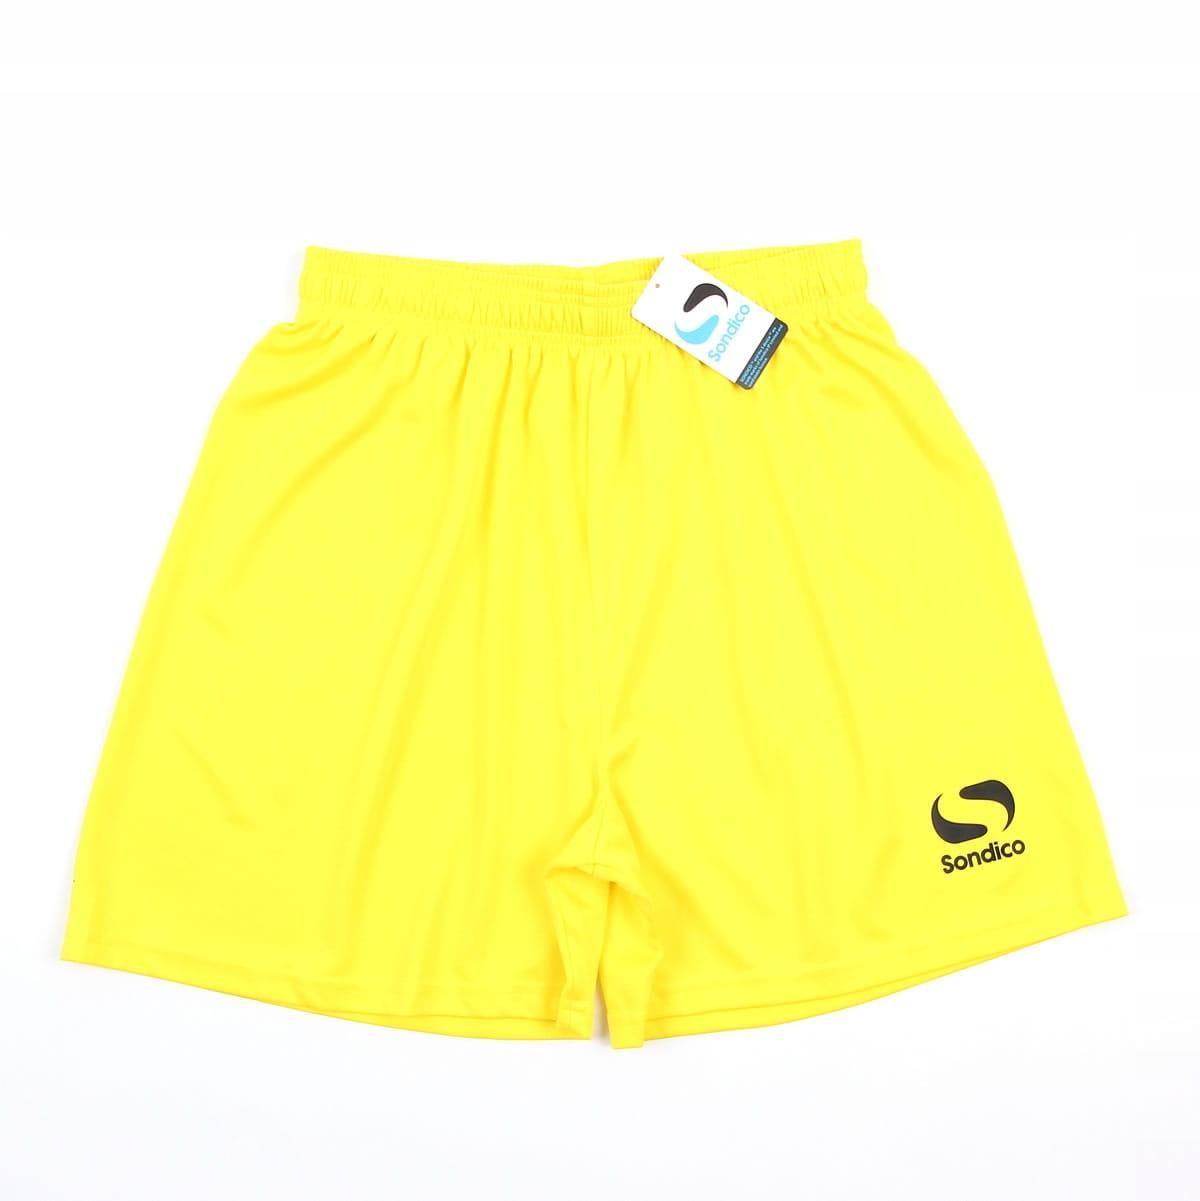 Spodenki piłkarskie Sondico XL